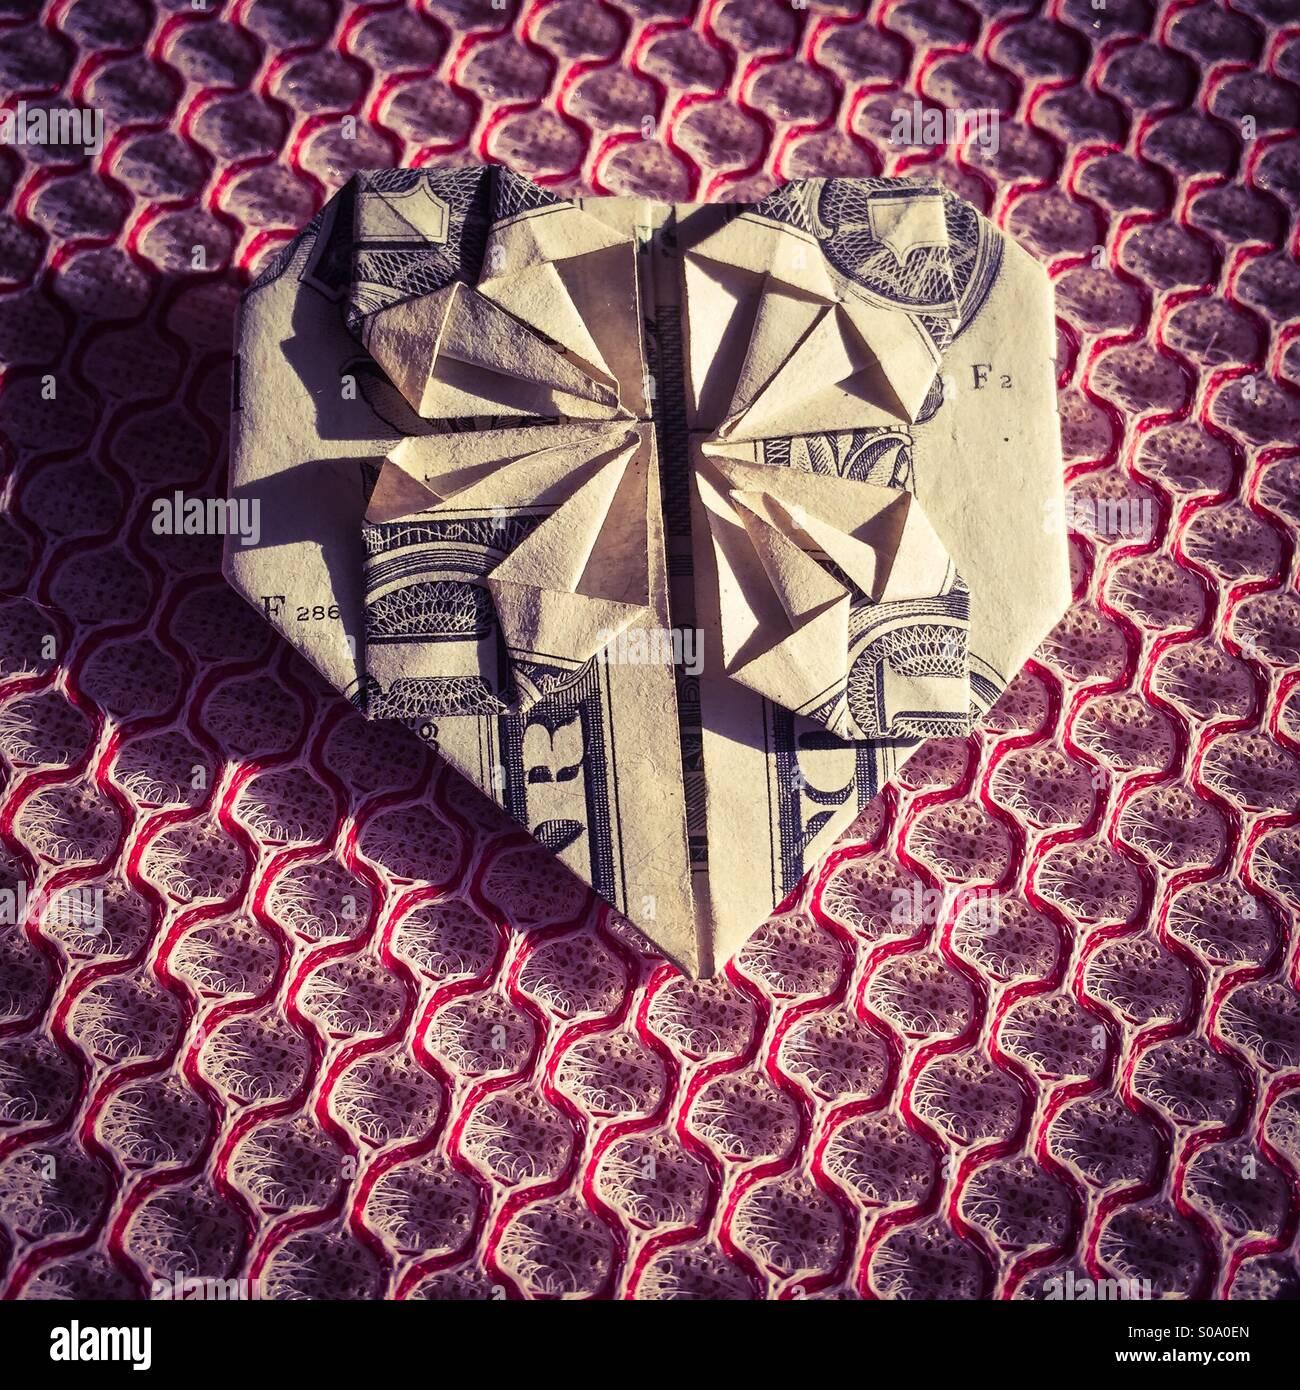 Dollar Heart Stock Photos & Dollar Heart Stock Images - Alamy - photo#49